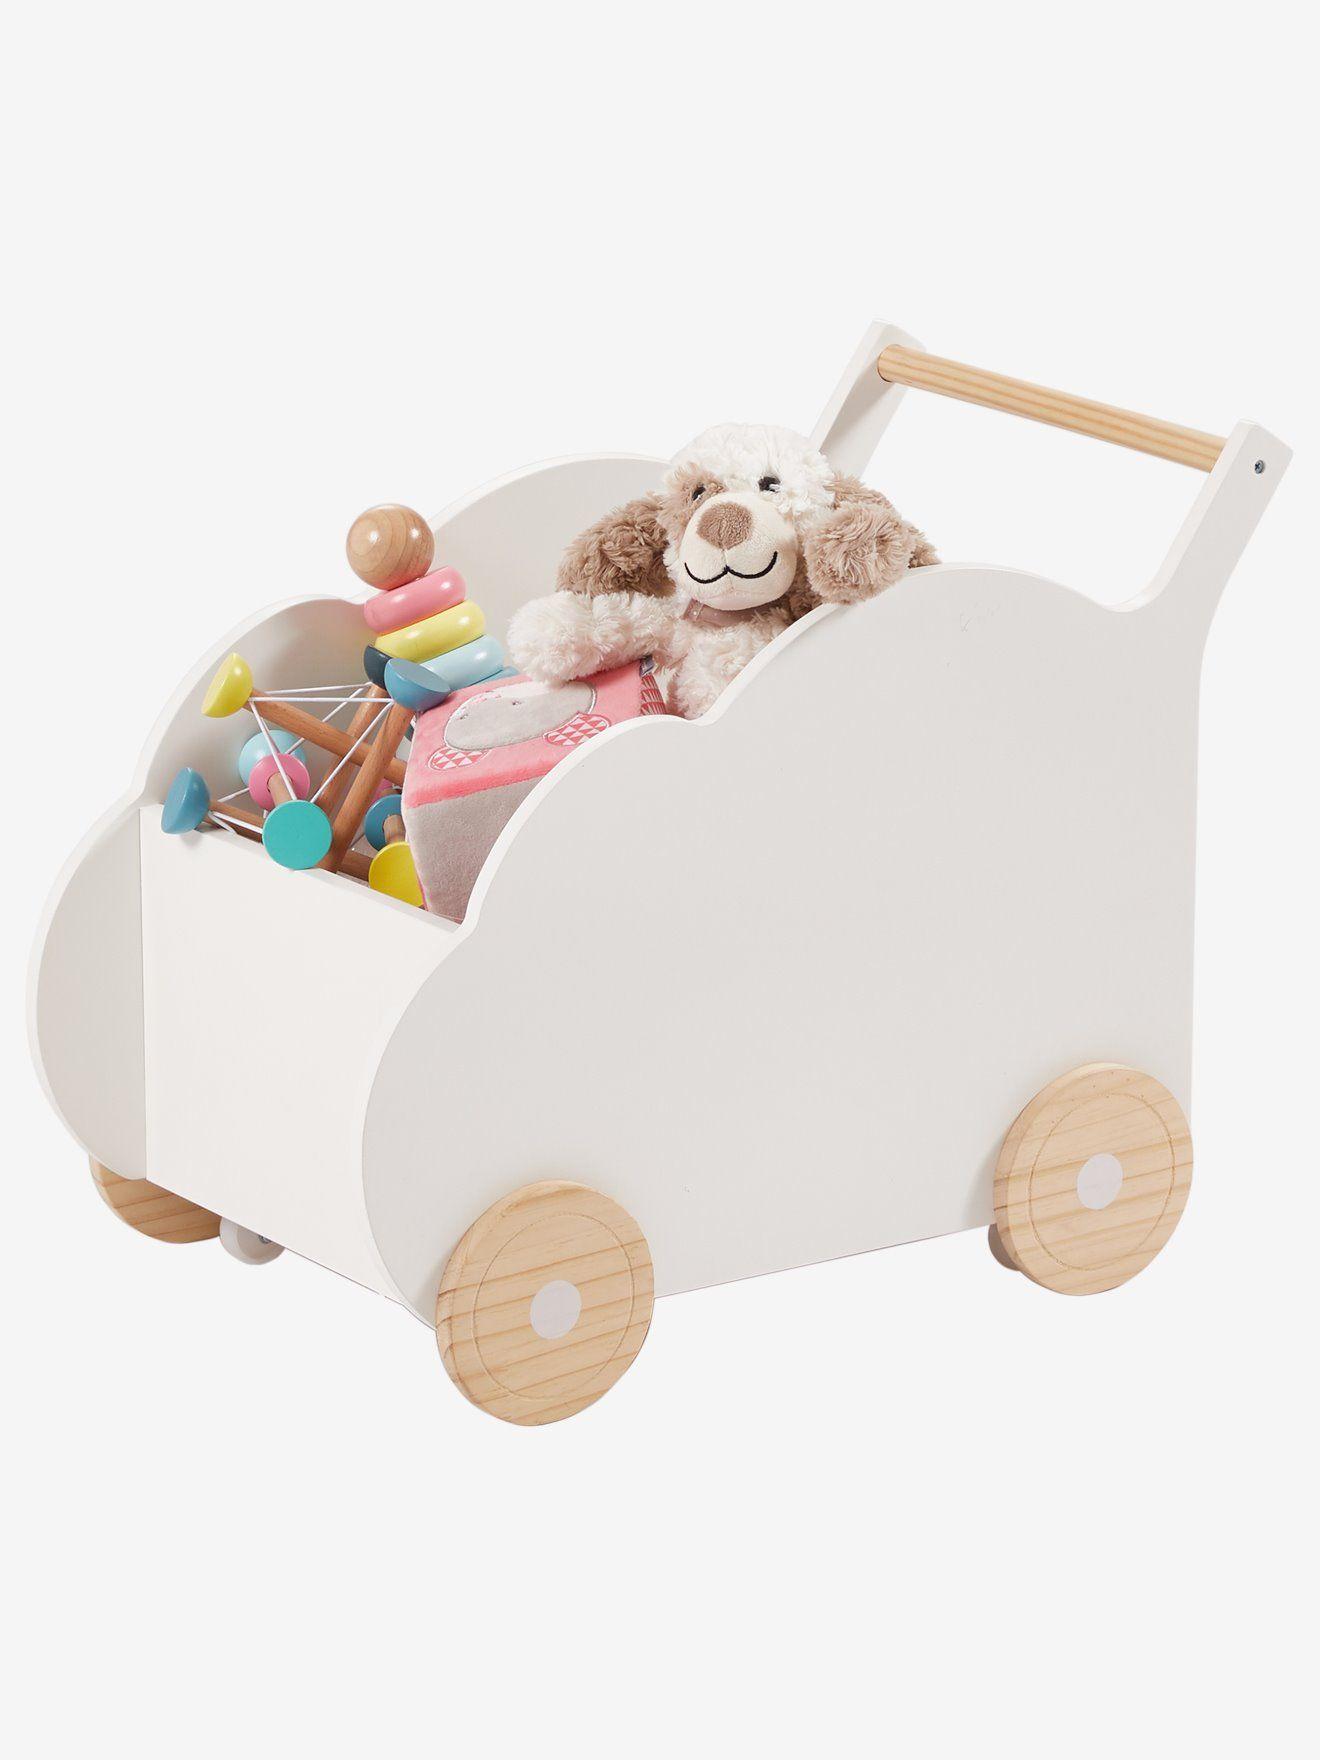 Box On Wheels Cloud White Light Solid With Design Bedroom Furniture Storage Vertbaudet Storage Kids Room Diy Dolls Pram Wooden Baby Walker